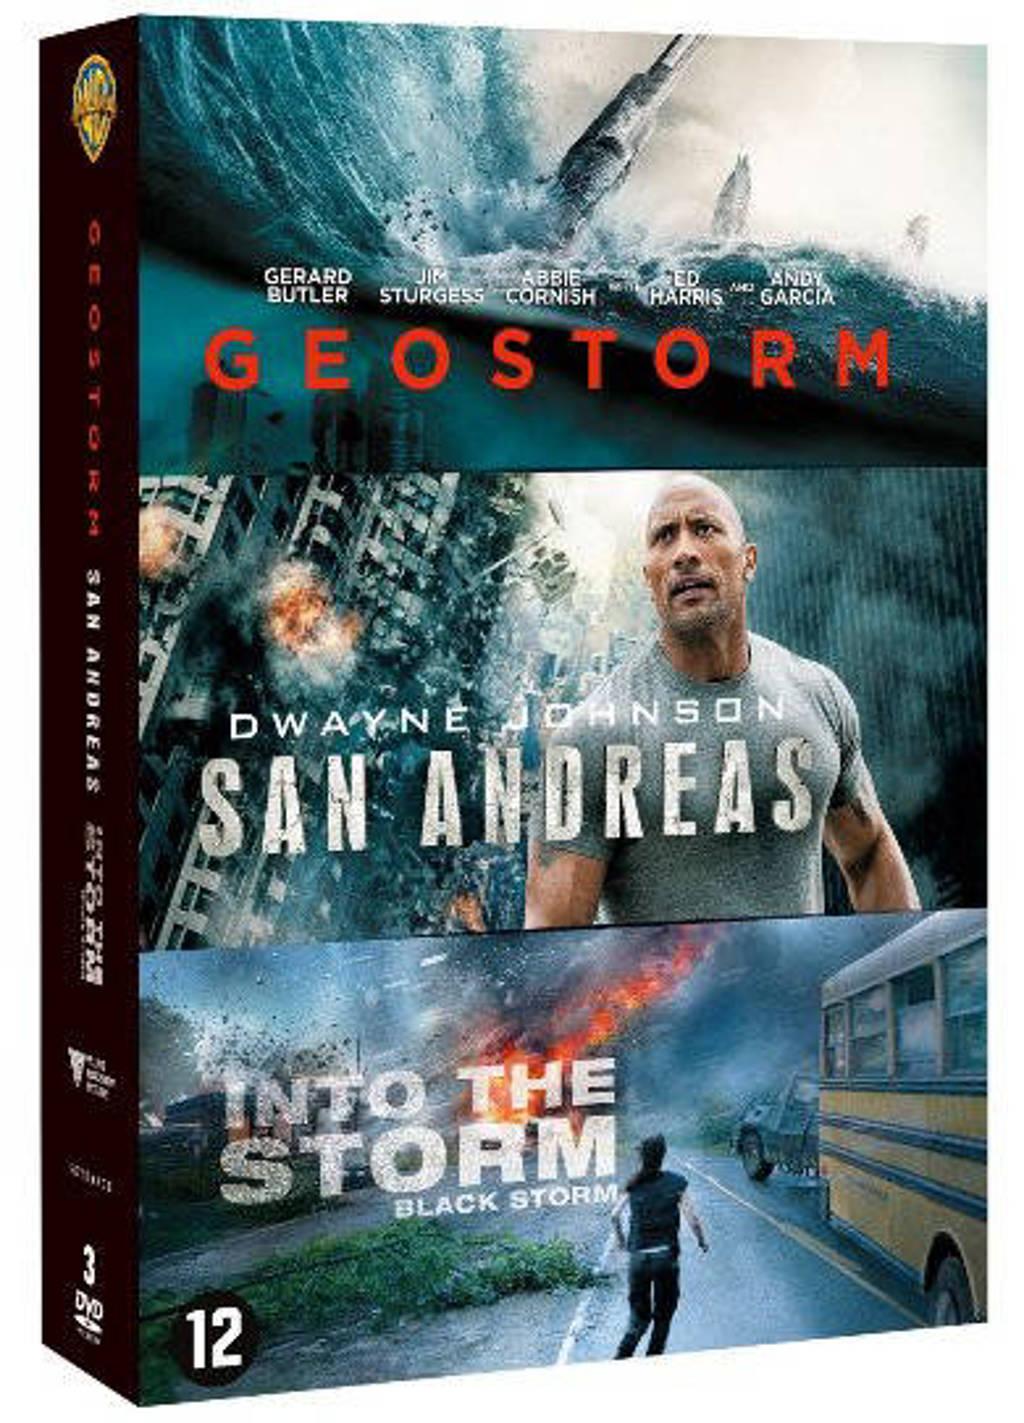 Disaster box (3 films) (DVD)